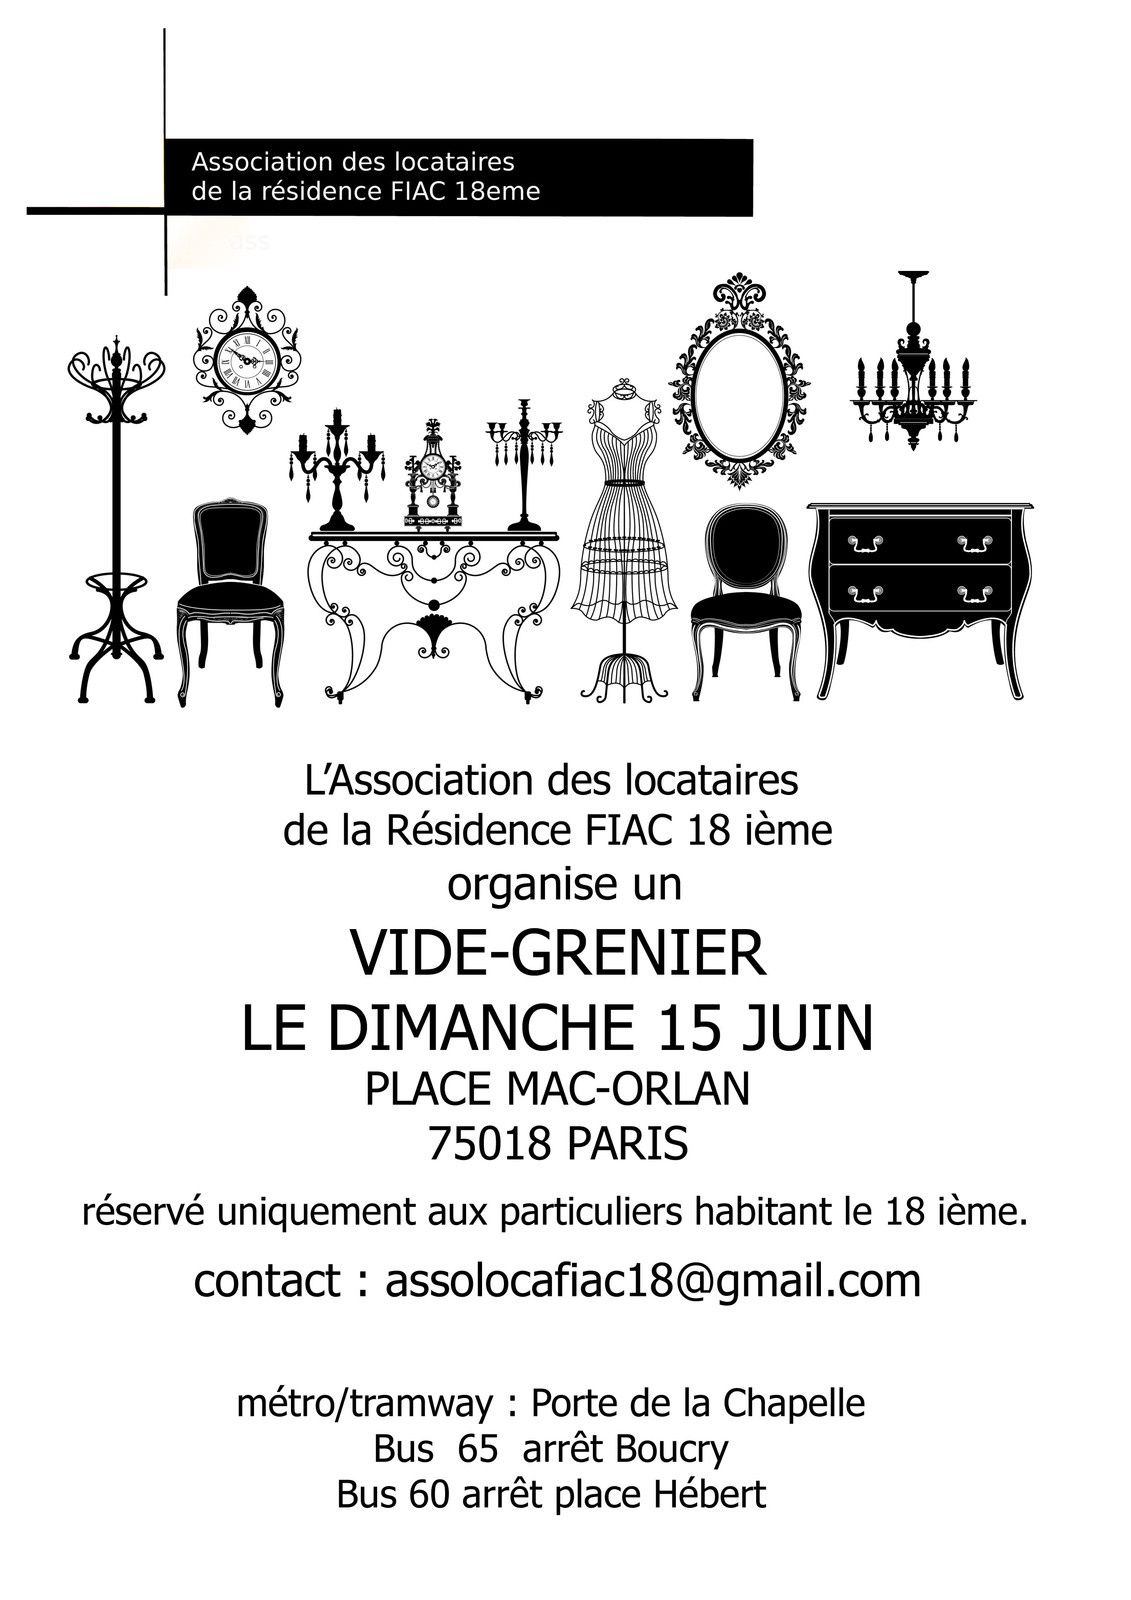 Vide-grenier place Mac-Orlan dimanche 15 juin 2014